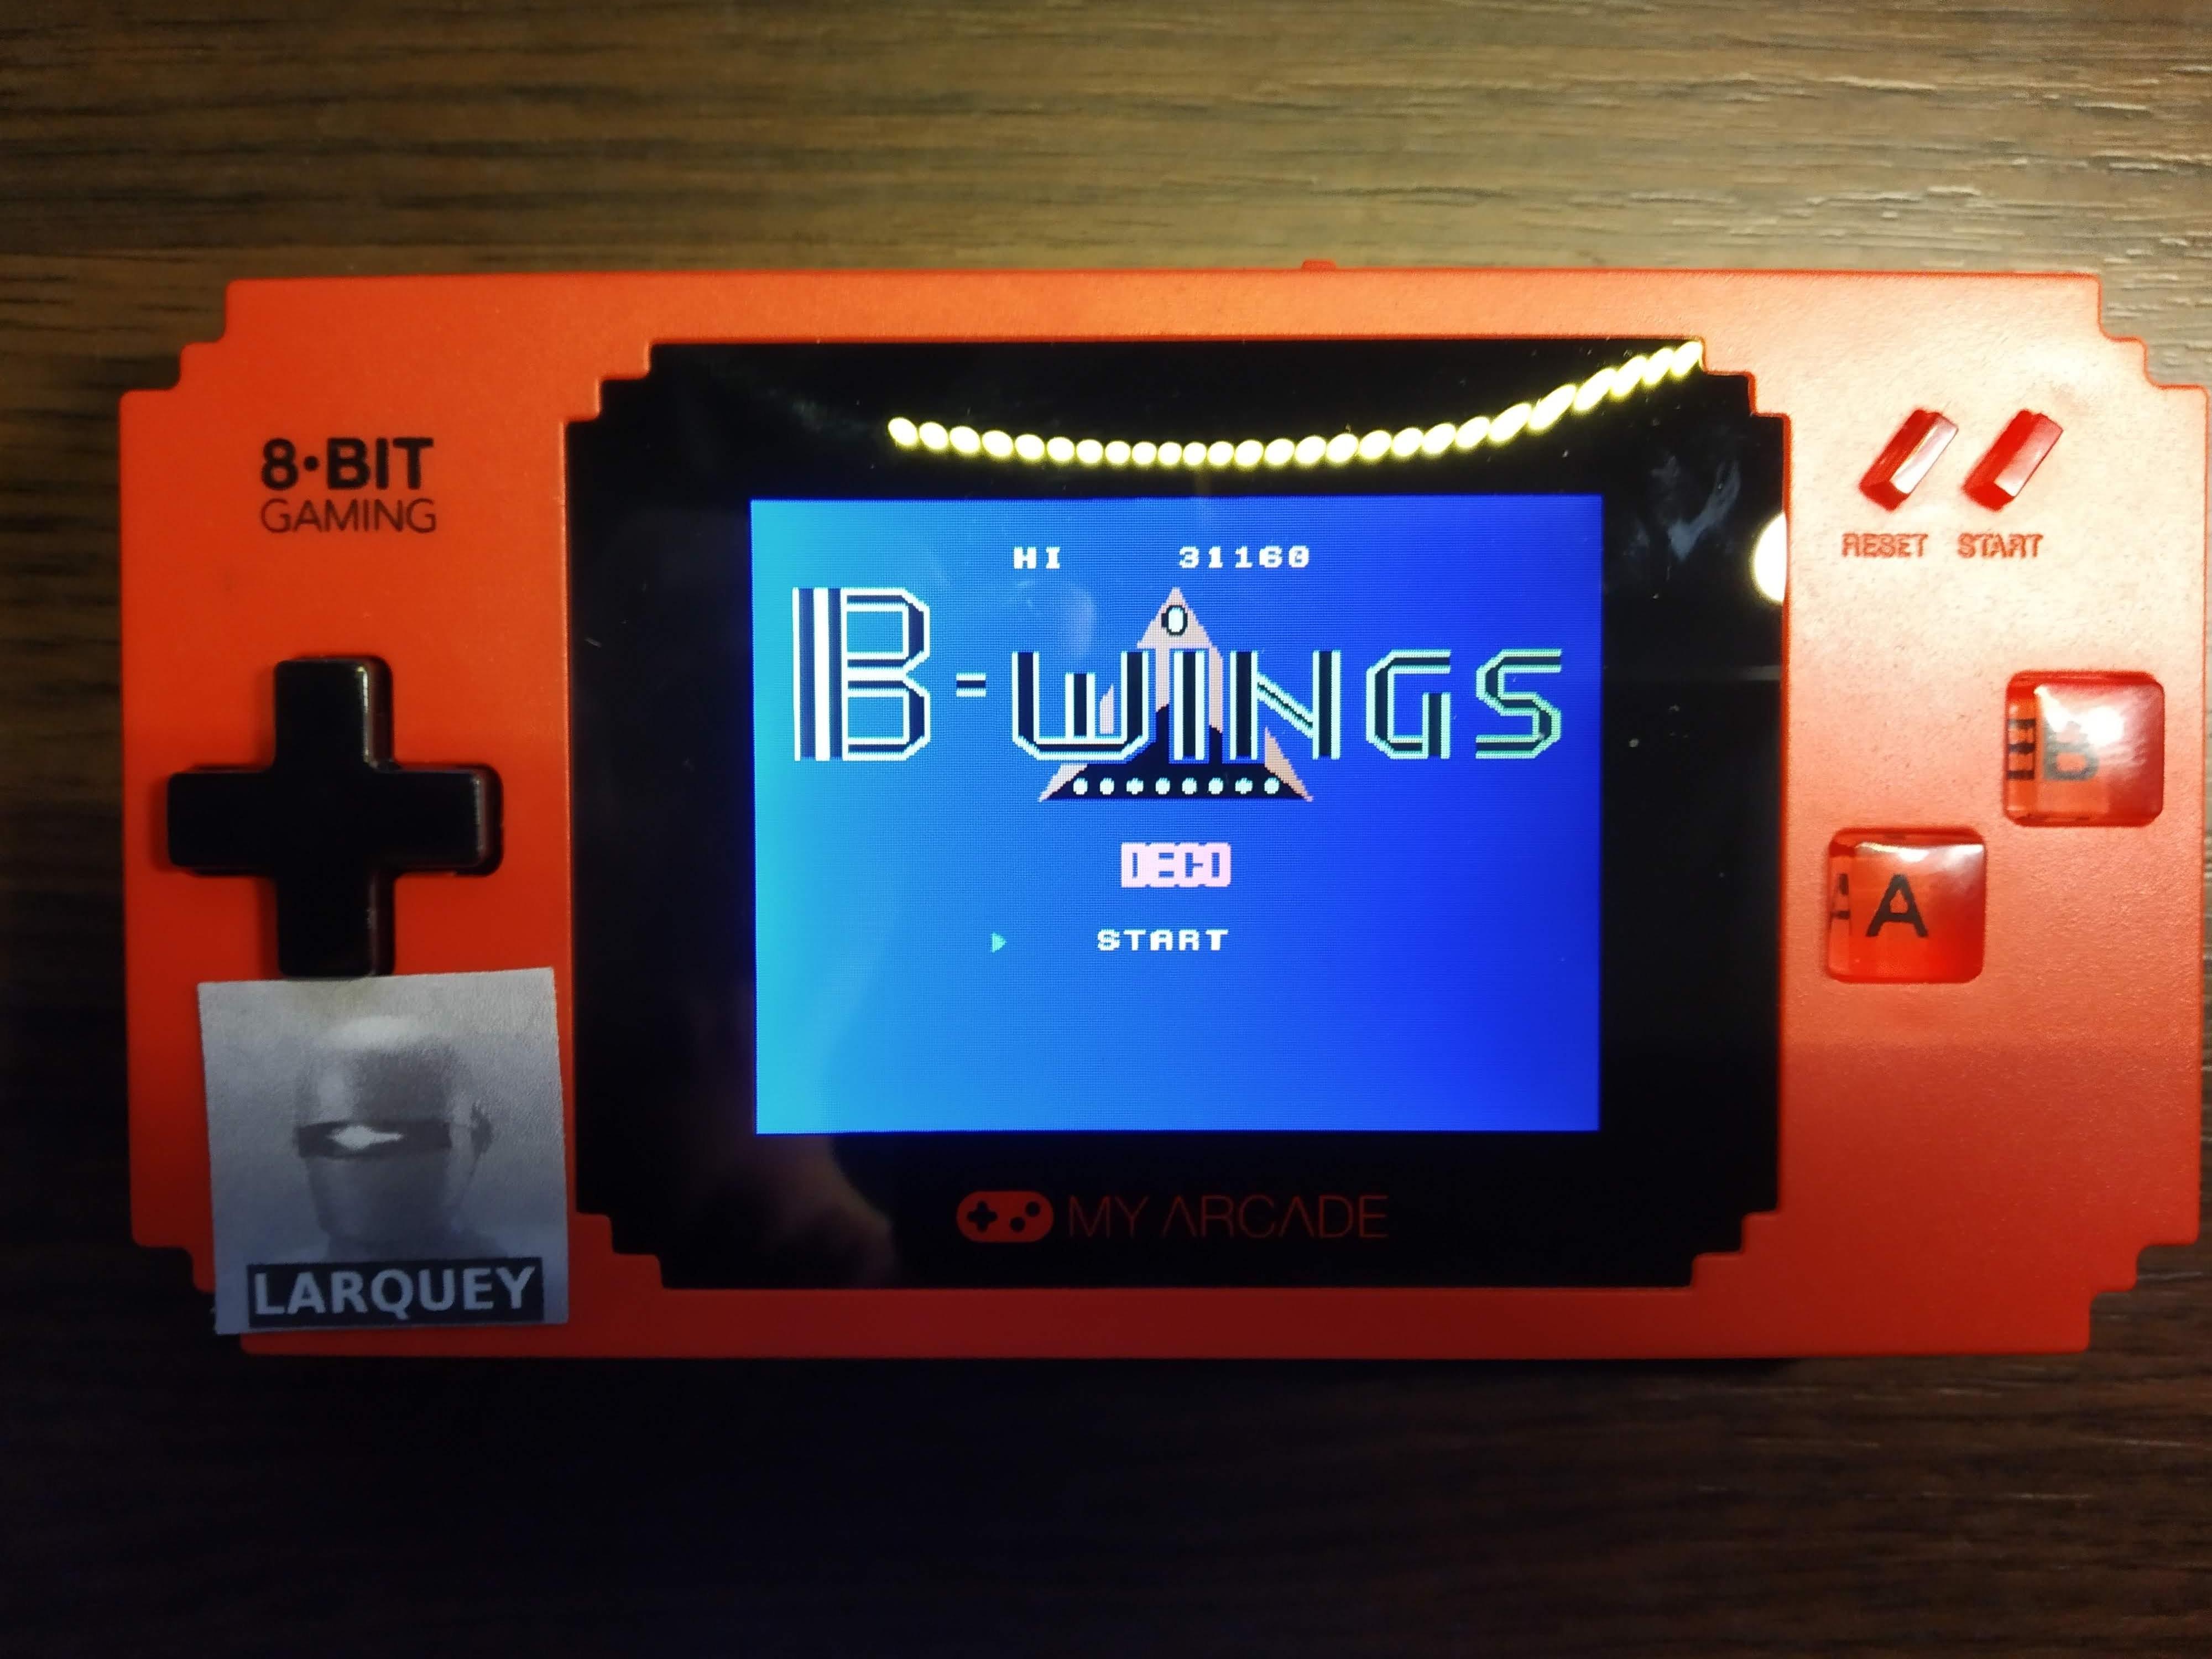 Larquey: My Arcade: B-Wings (Dedicated Handheld) 31,160 points on 2019-12-08 11:33:03